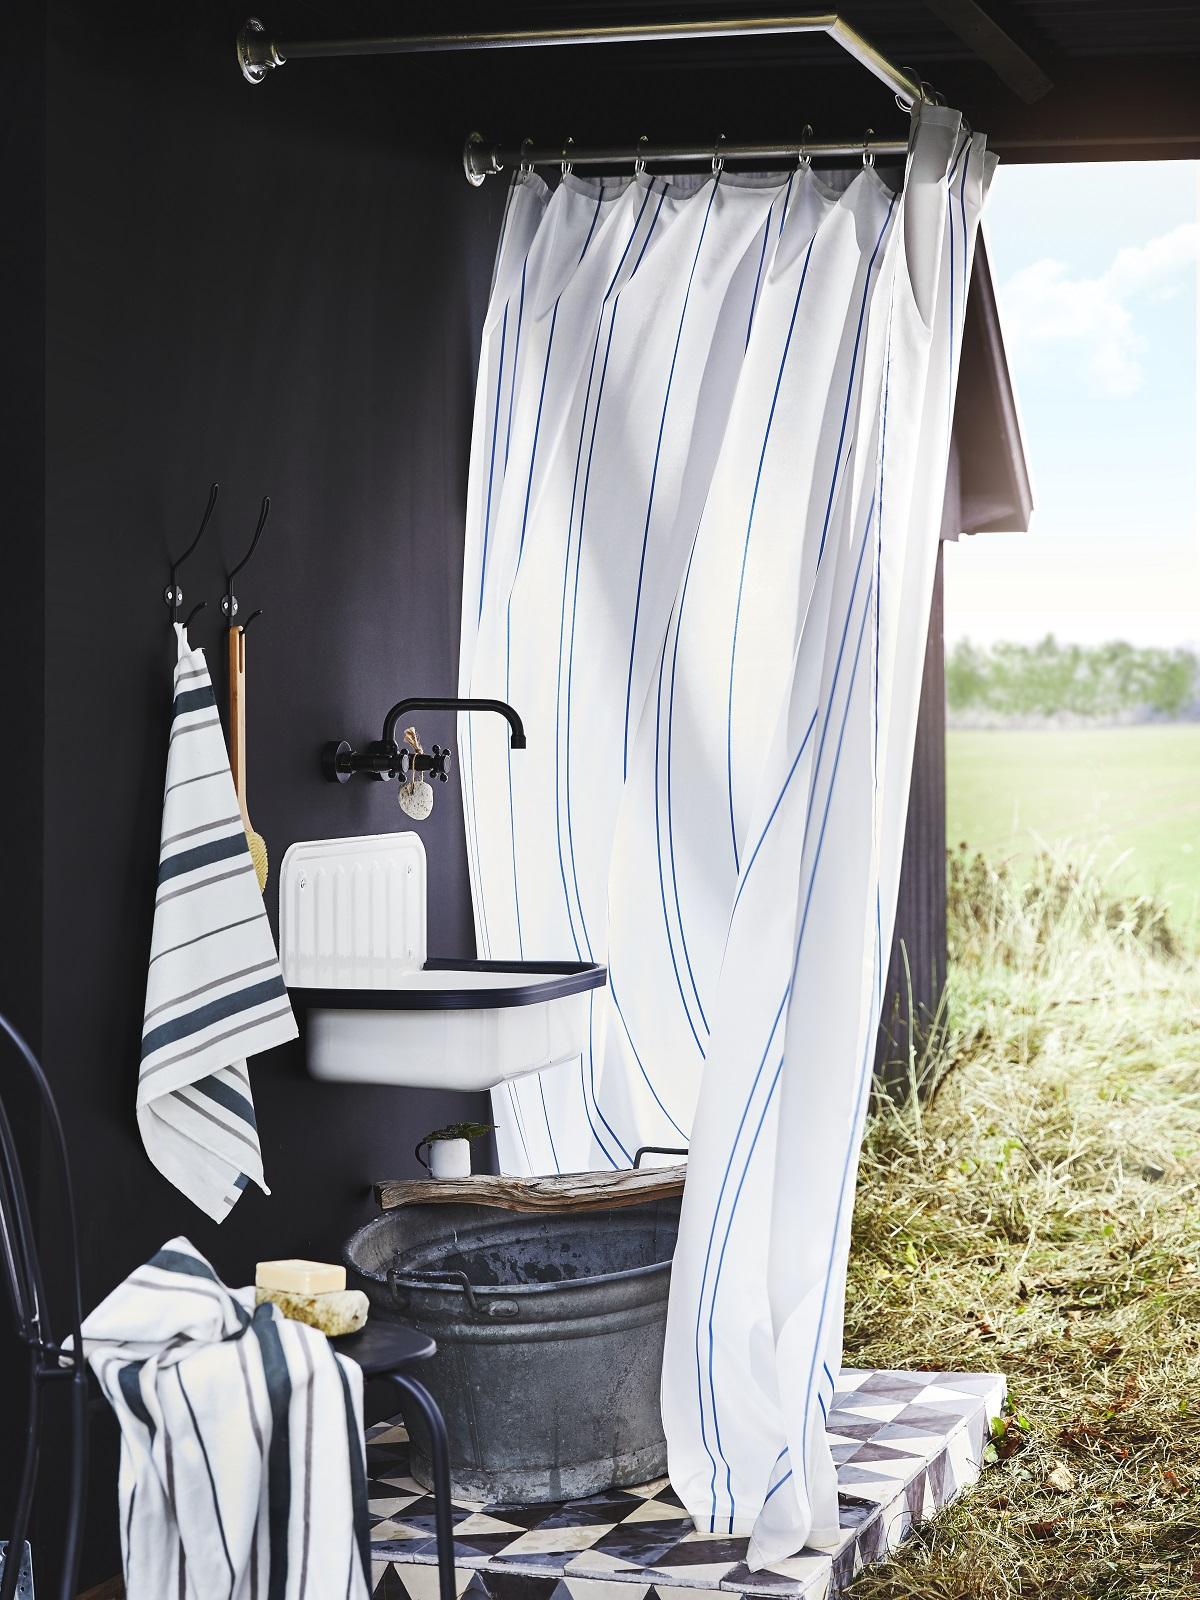 Ottsjön towel shower curtain (made from recylced PET bottles)